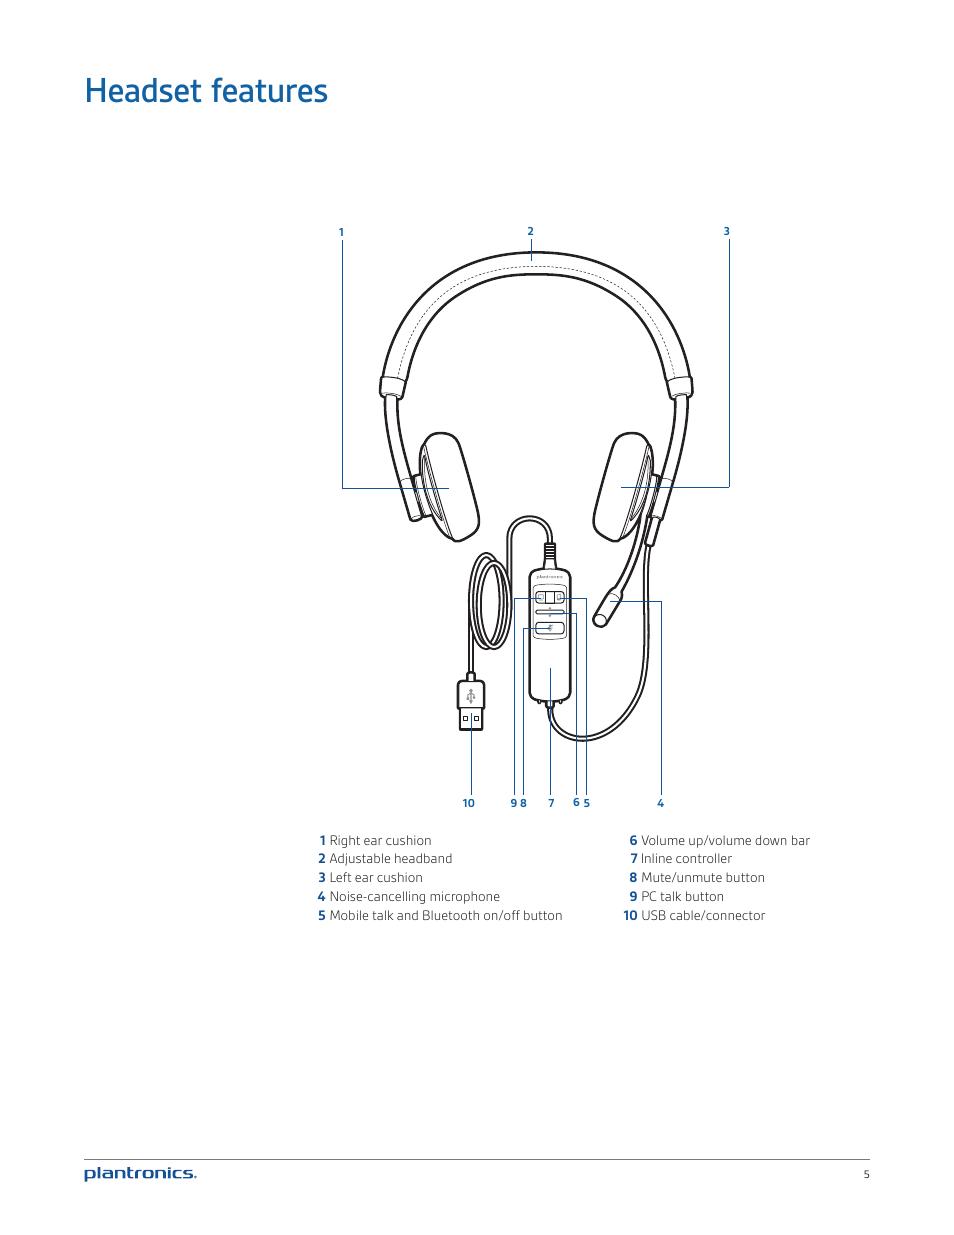 WRG-1299] Plantronics Headset Wiring Diagram